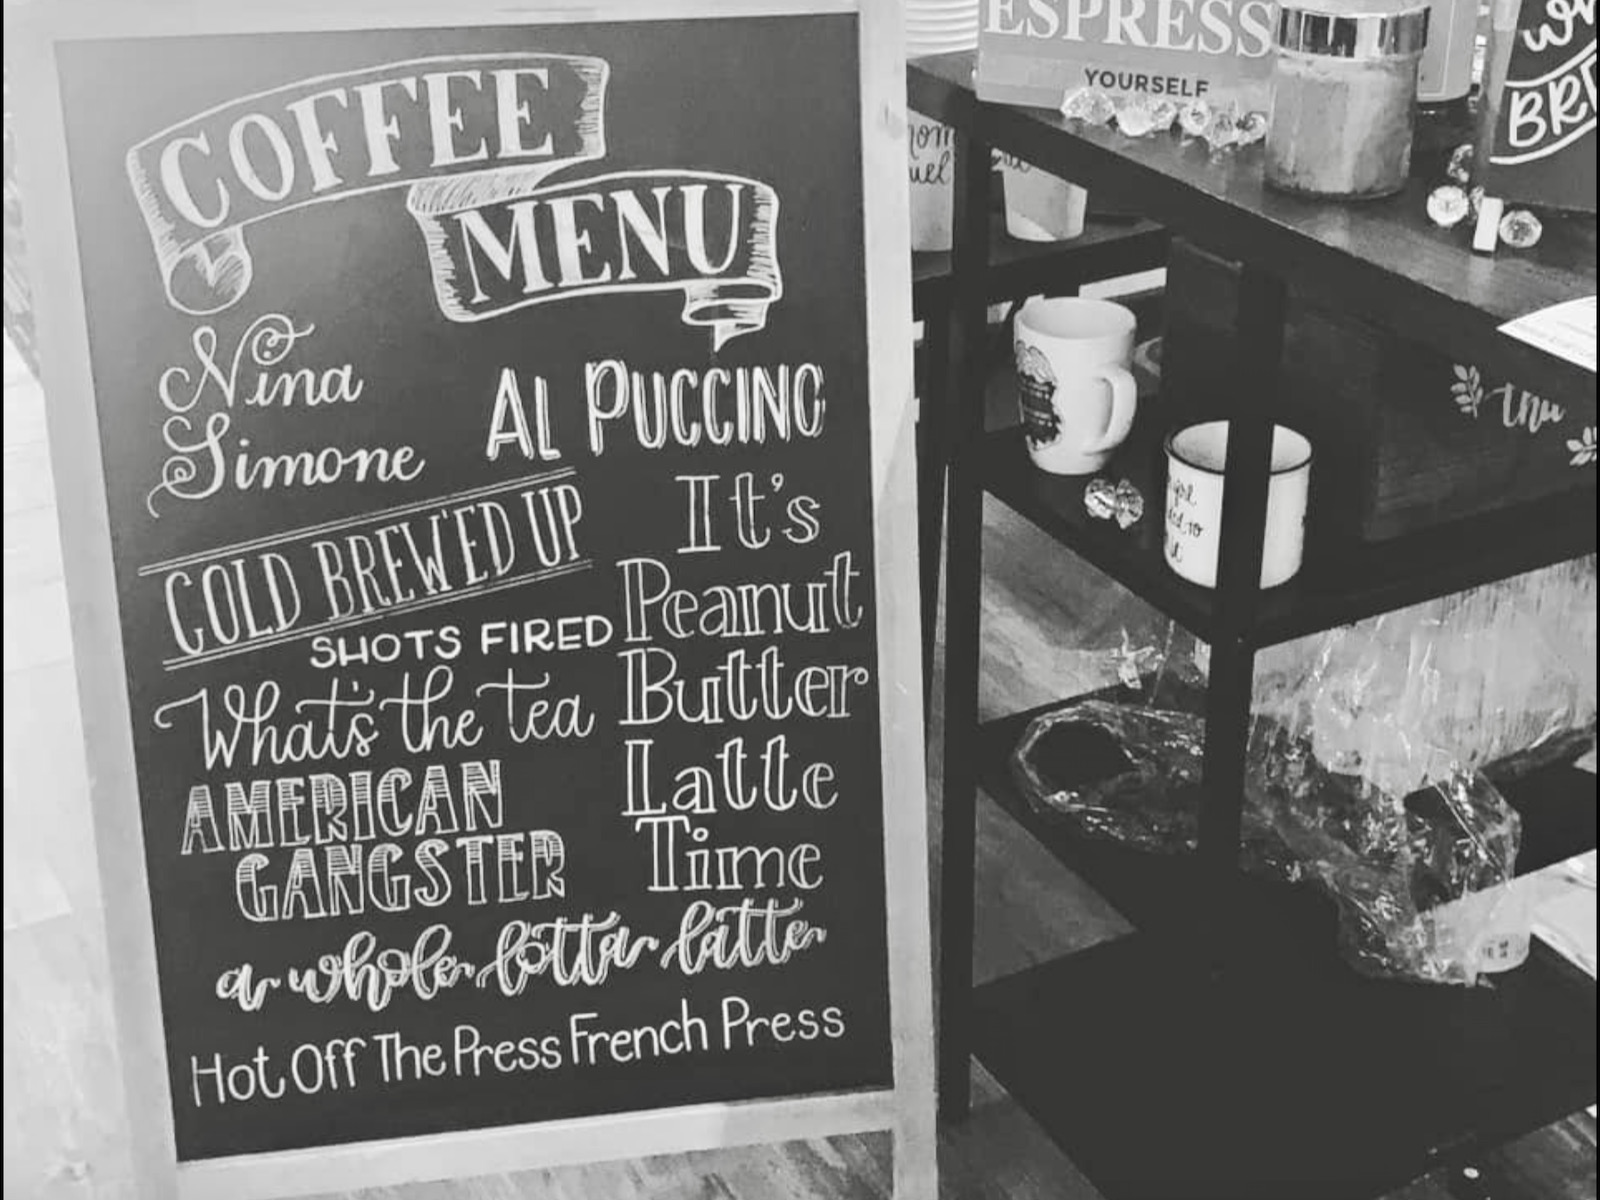 Boujee Cup of Joe menu board